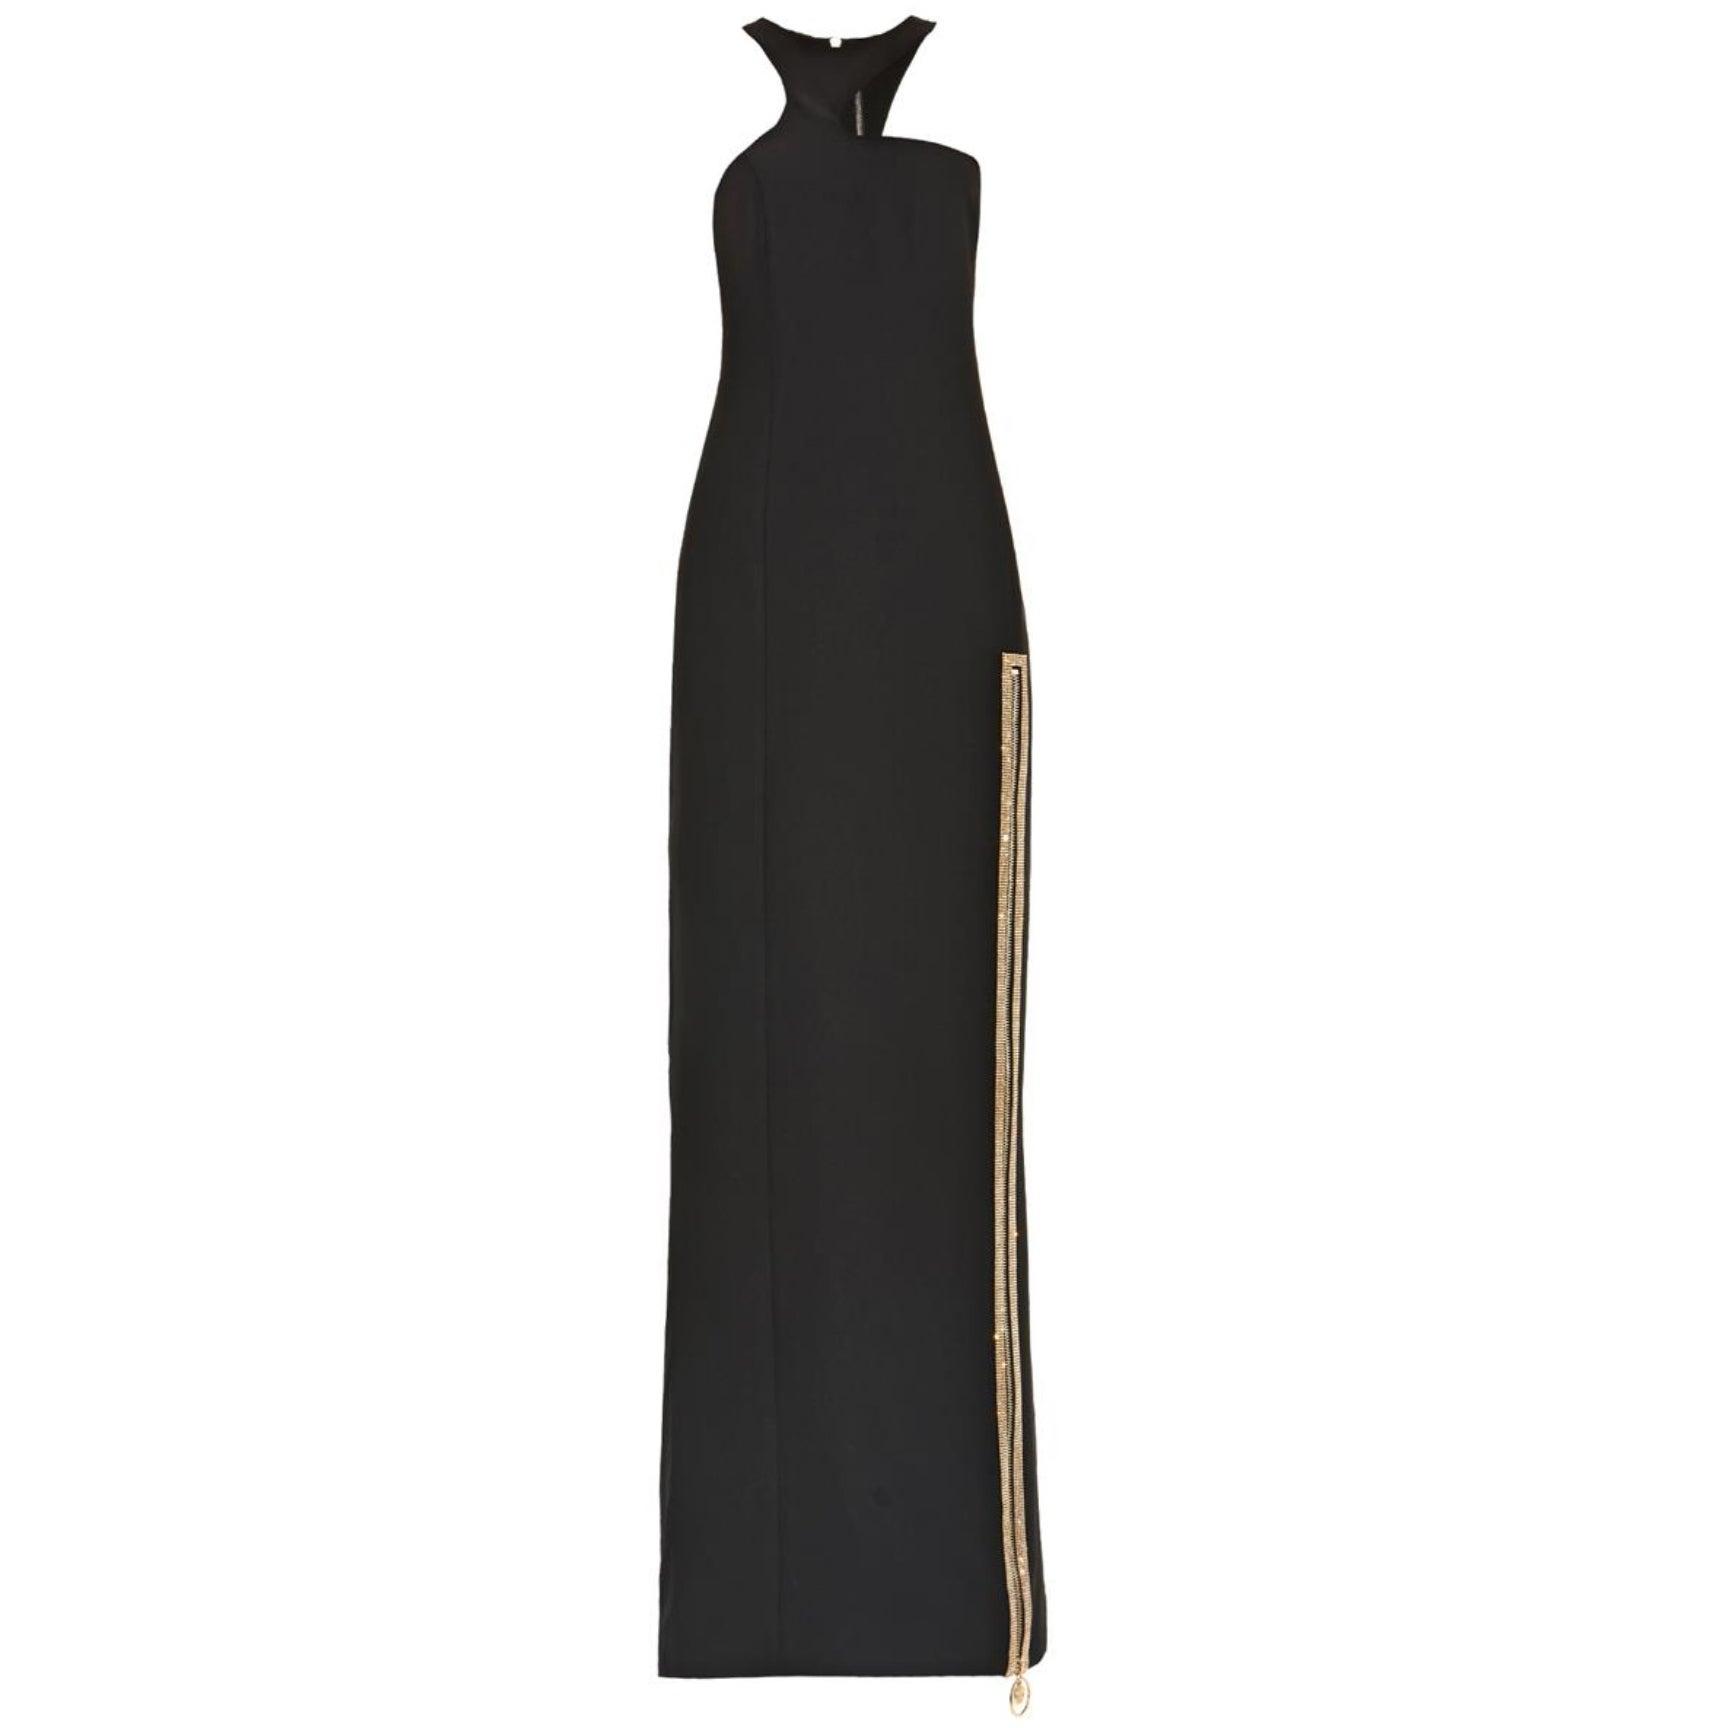 Versace Black Crystal-Embellished Silk Gown at 1stdibs